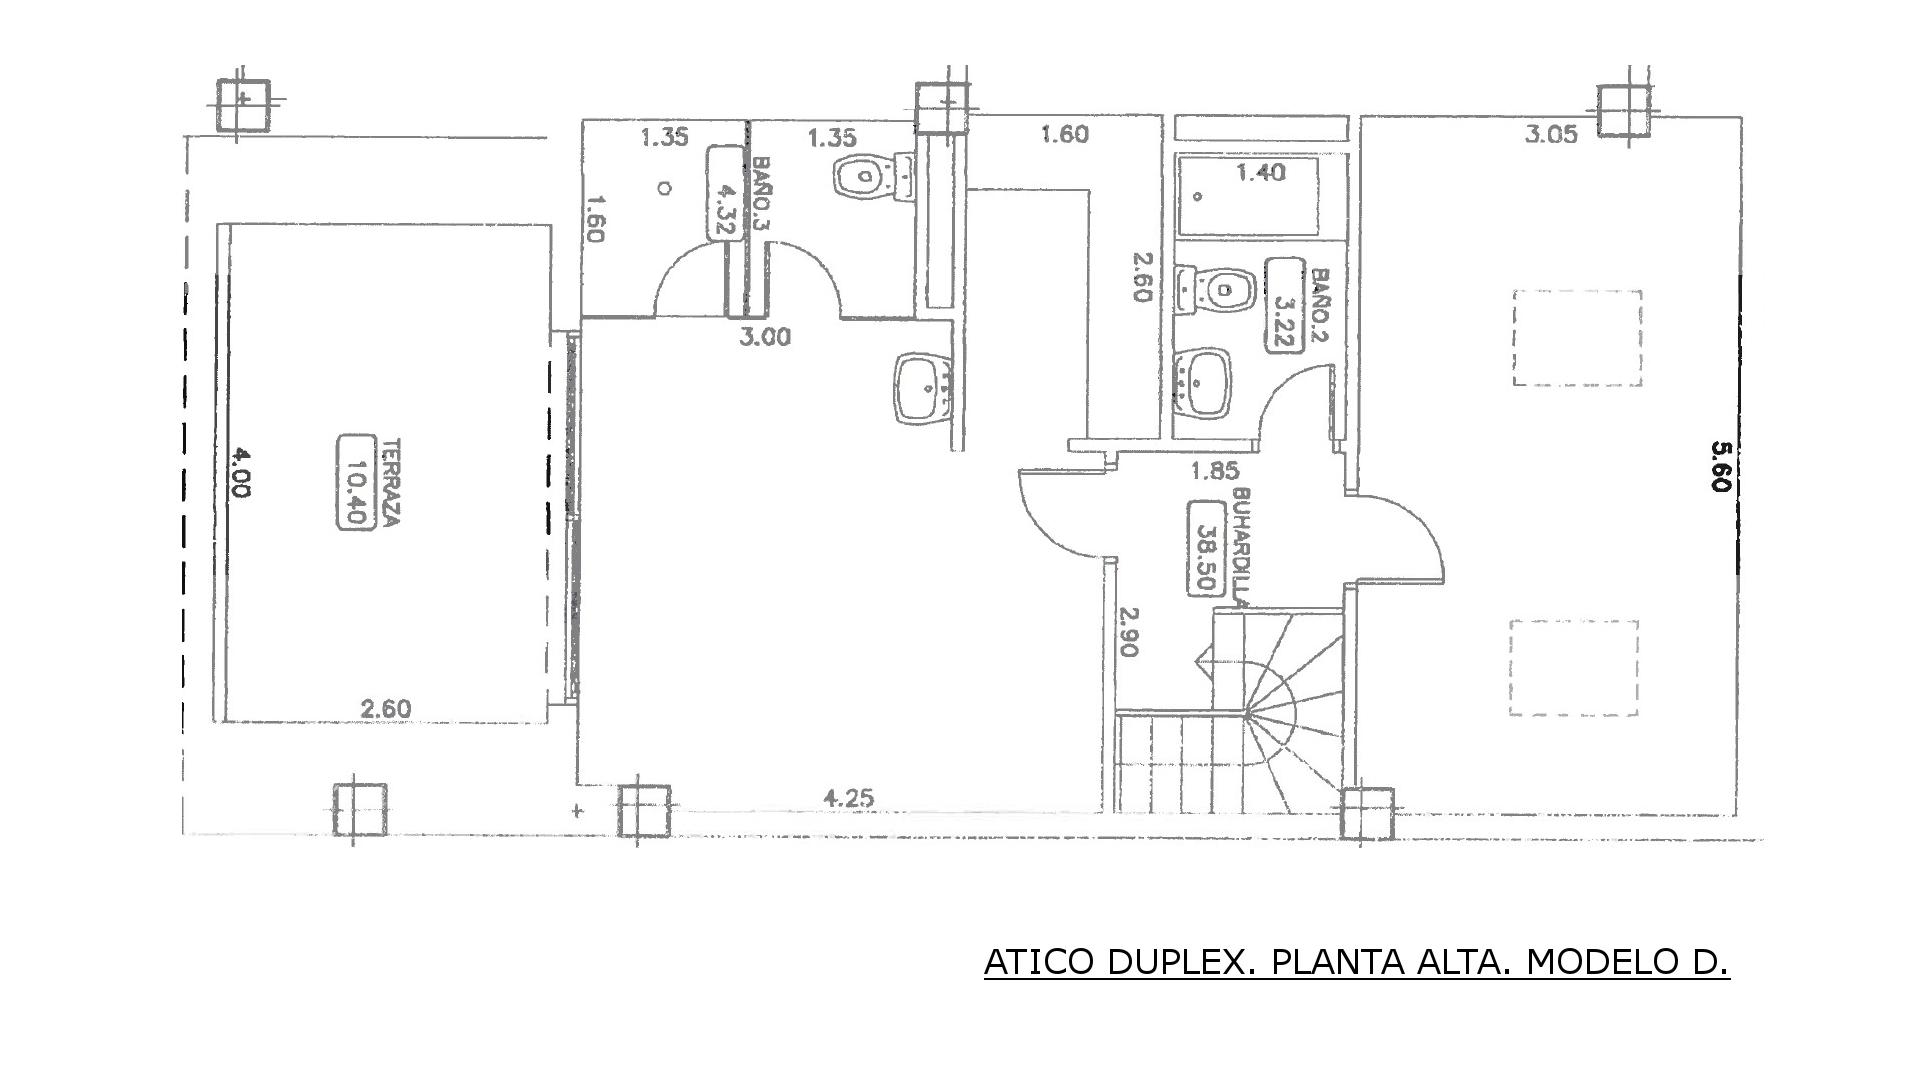 PLANTA ALTA. ATICO D.